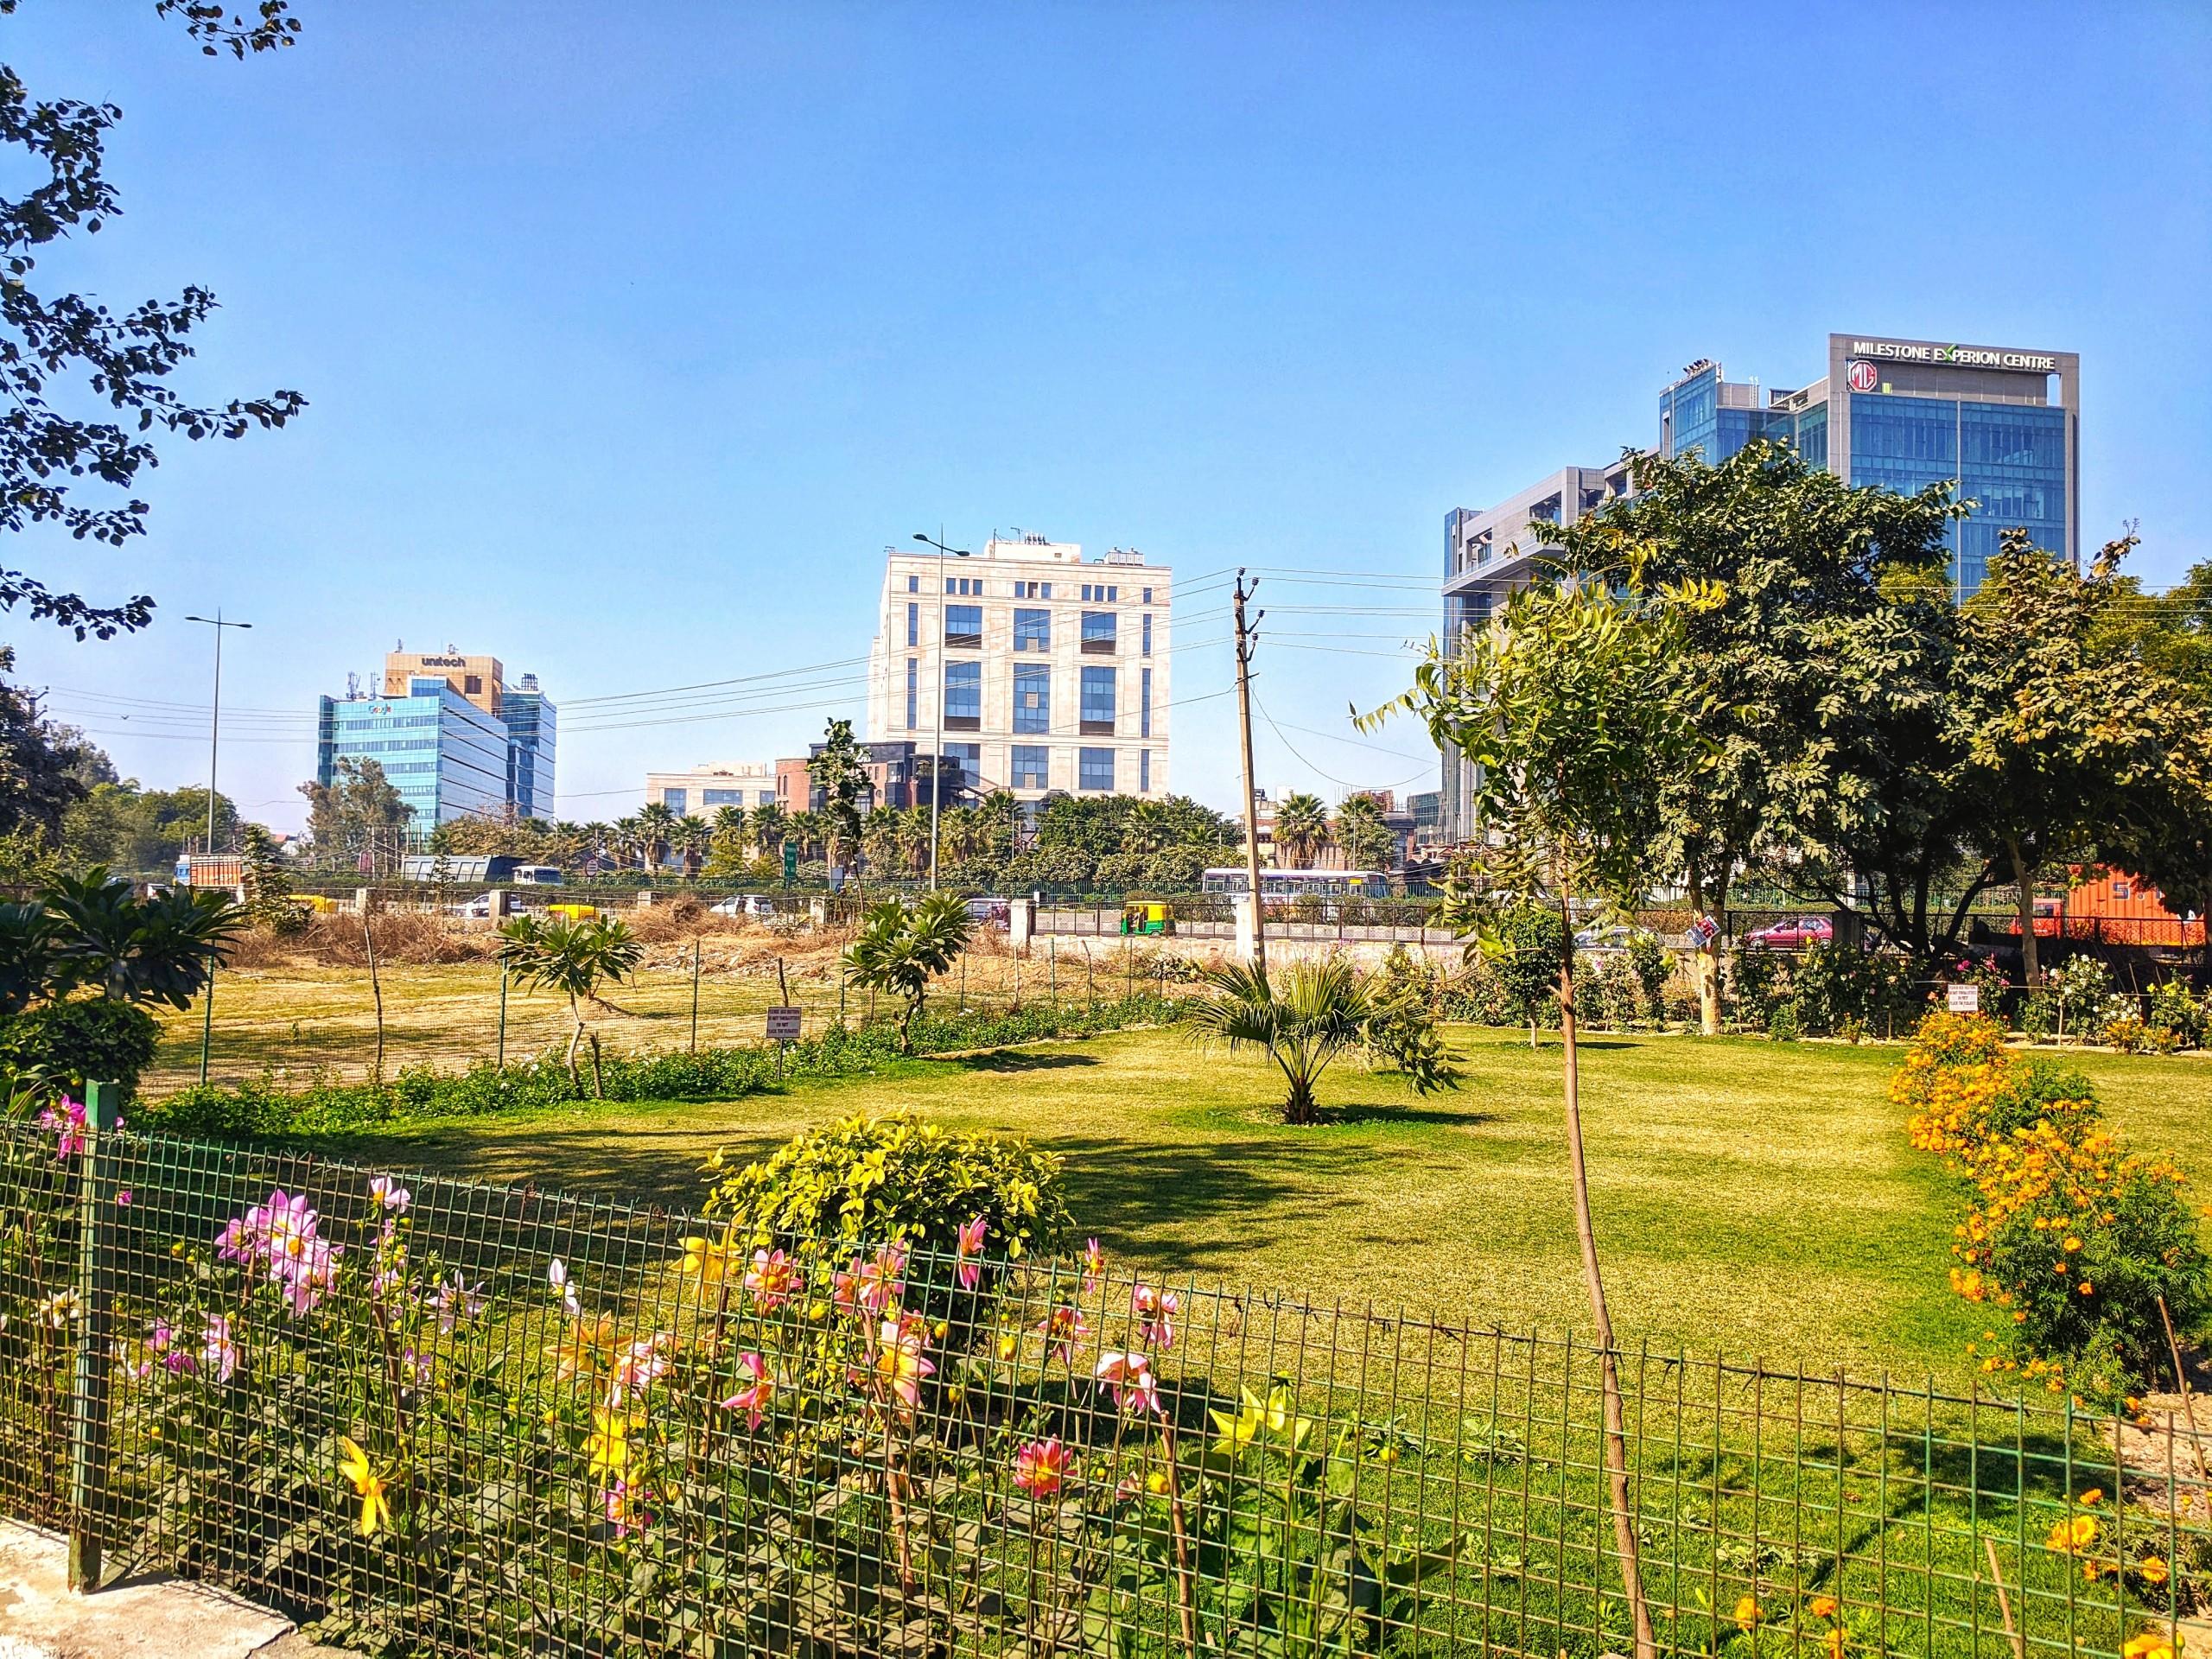 Buildings and Roadside Plants